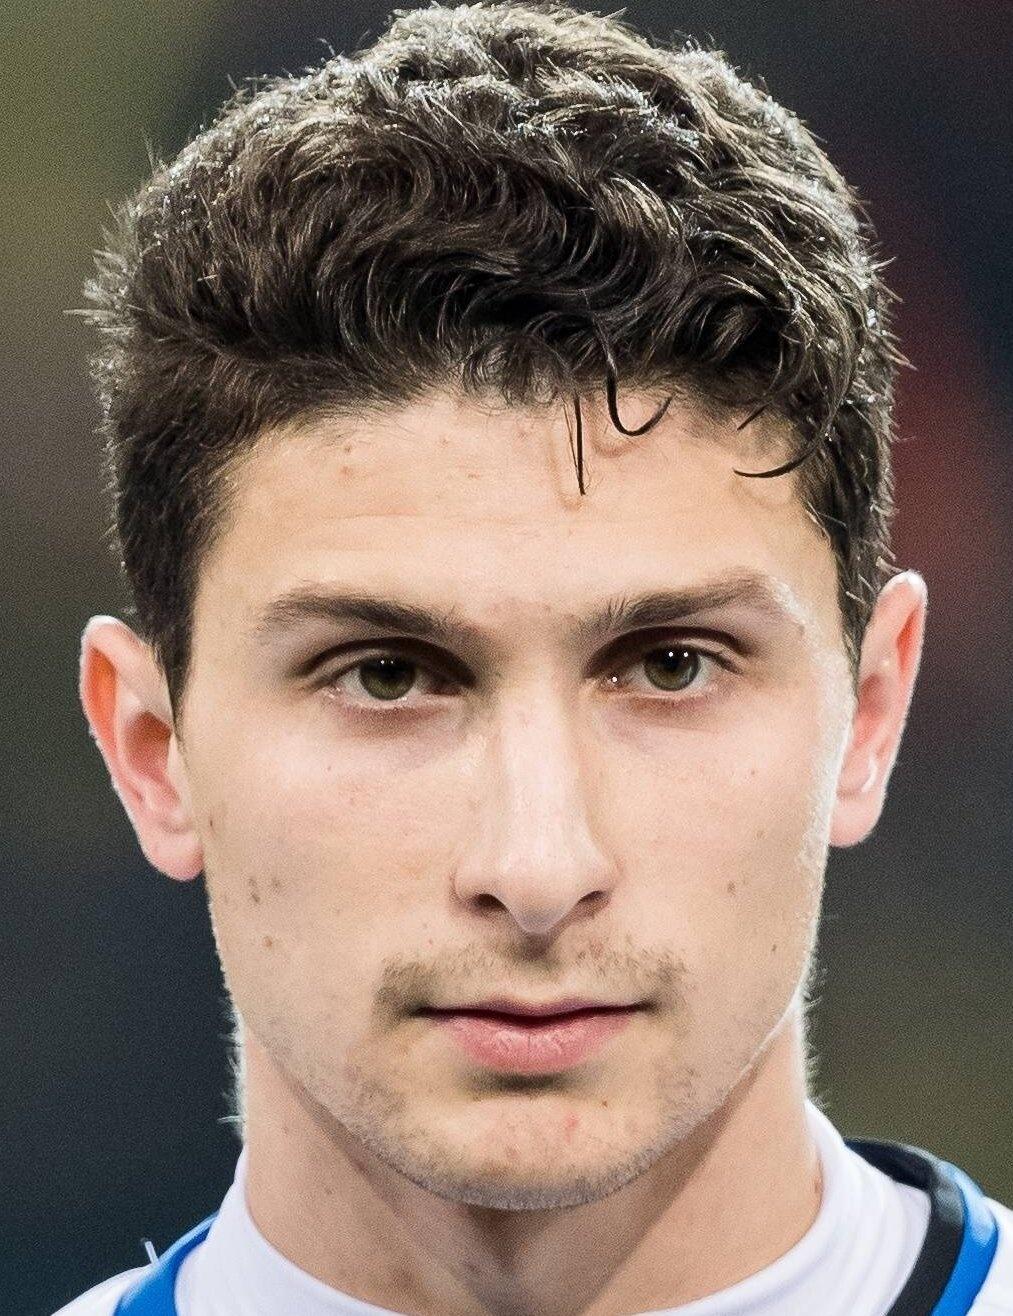 Mattia Caldara - Player Profile 19/20 | Transfermarkt